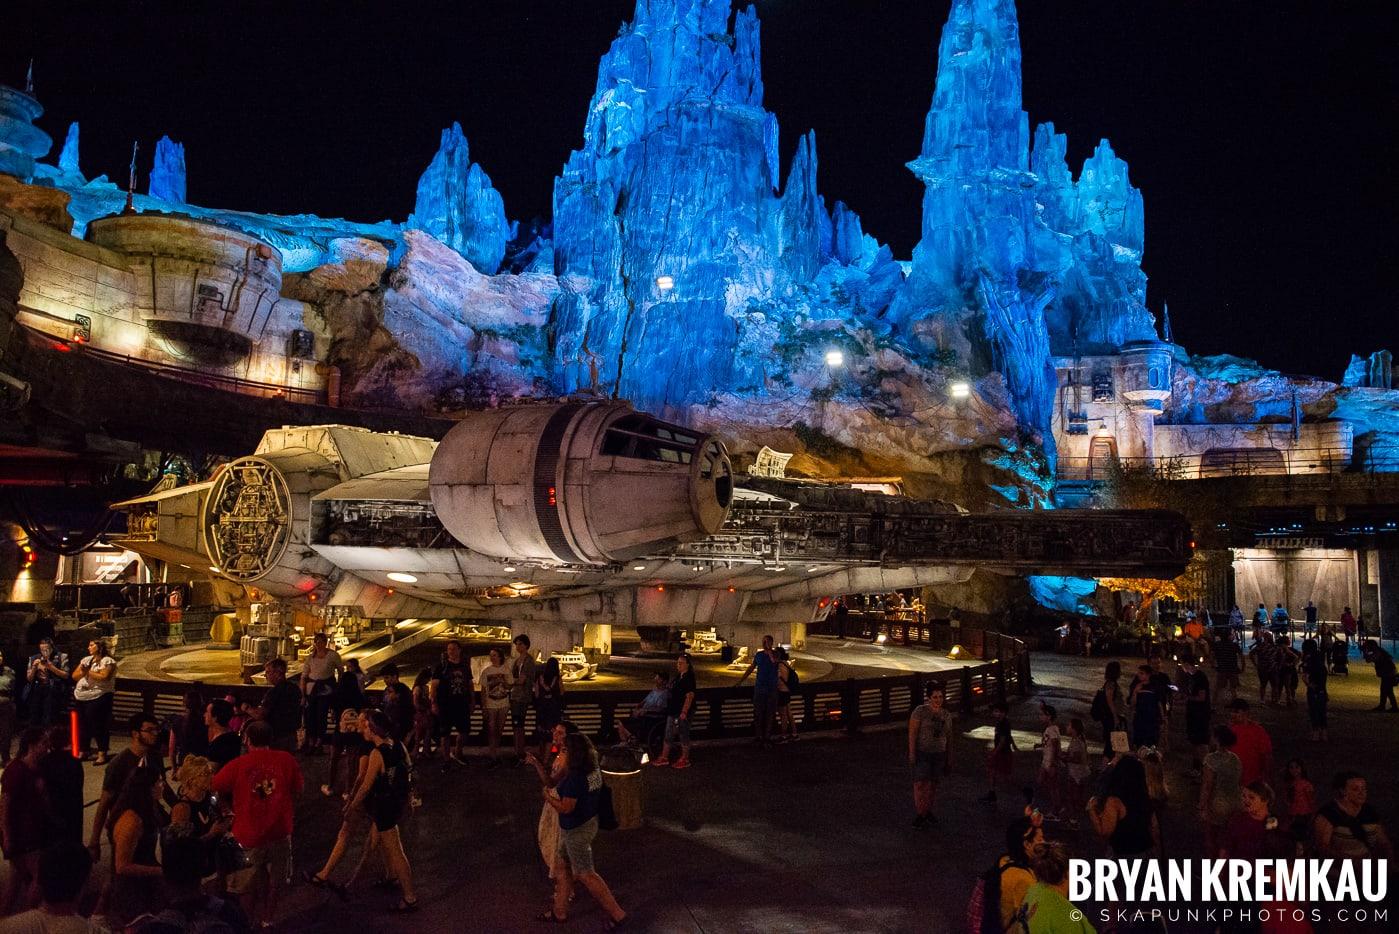 Walt Disney World Vacation: Day 6 (Magic Kingdom, Epcot, Disney's Hollywood Studios) - 10.4.19 (21)